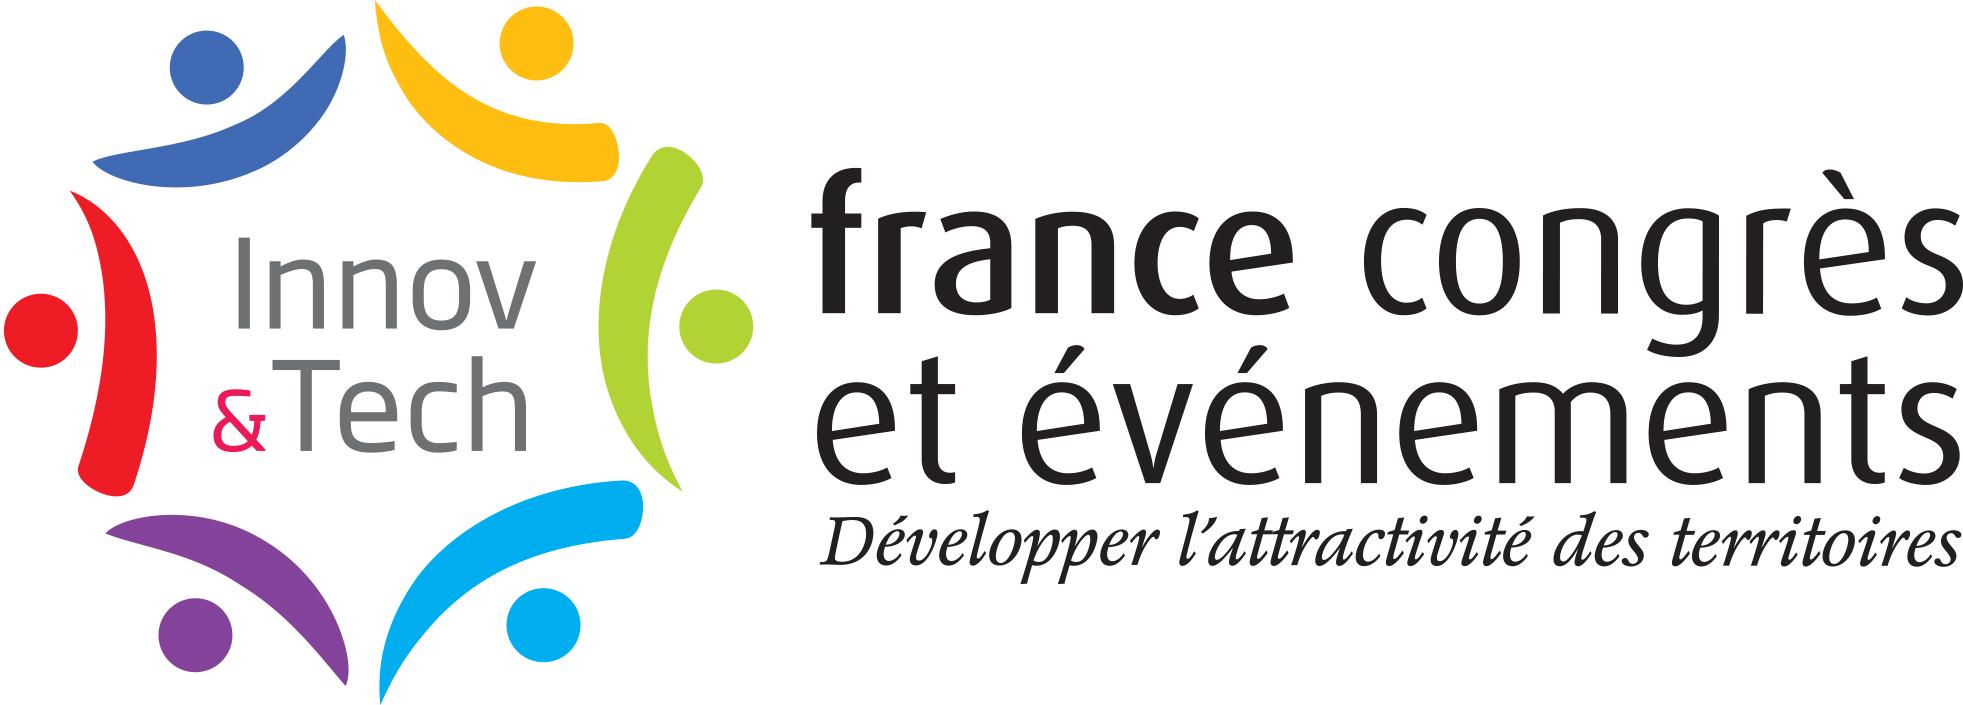 Francecongresnouveaulogo2017cmjnhorizontalinnov14889664591488966459